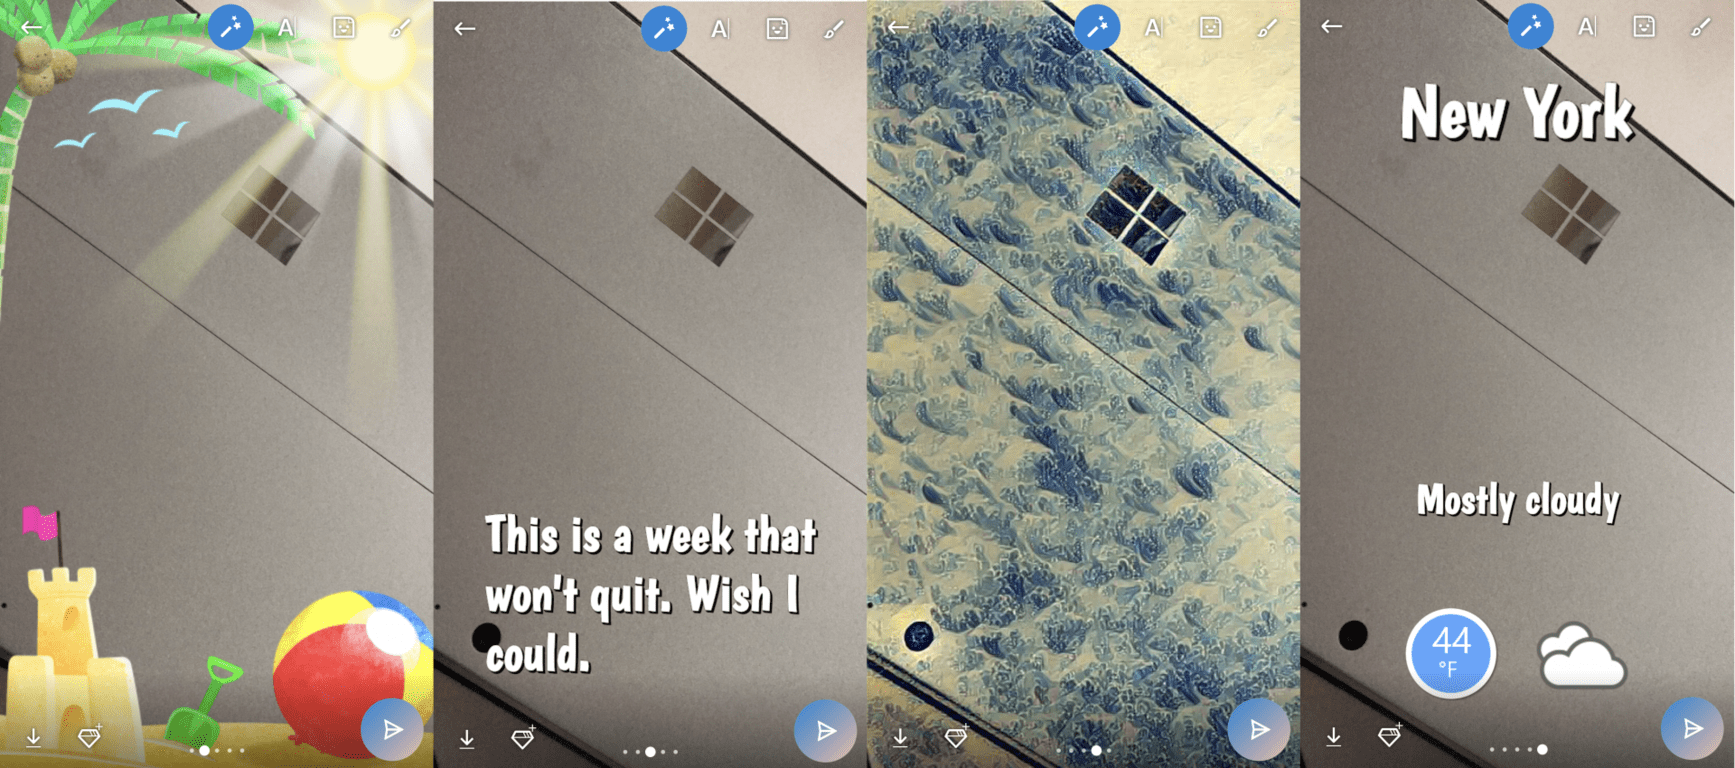 Skype Highlights picks up new Snapchat-like photos effects OnMSFT.com November 8, 2017